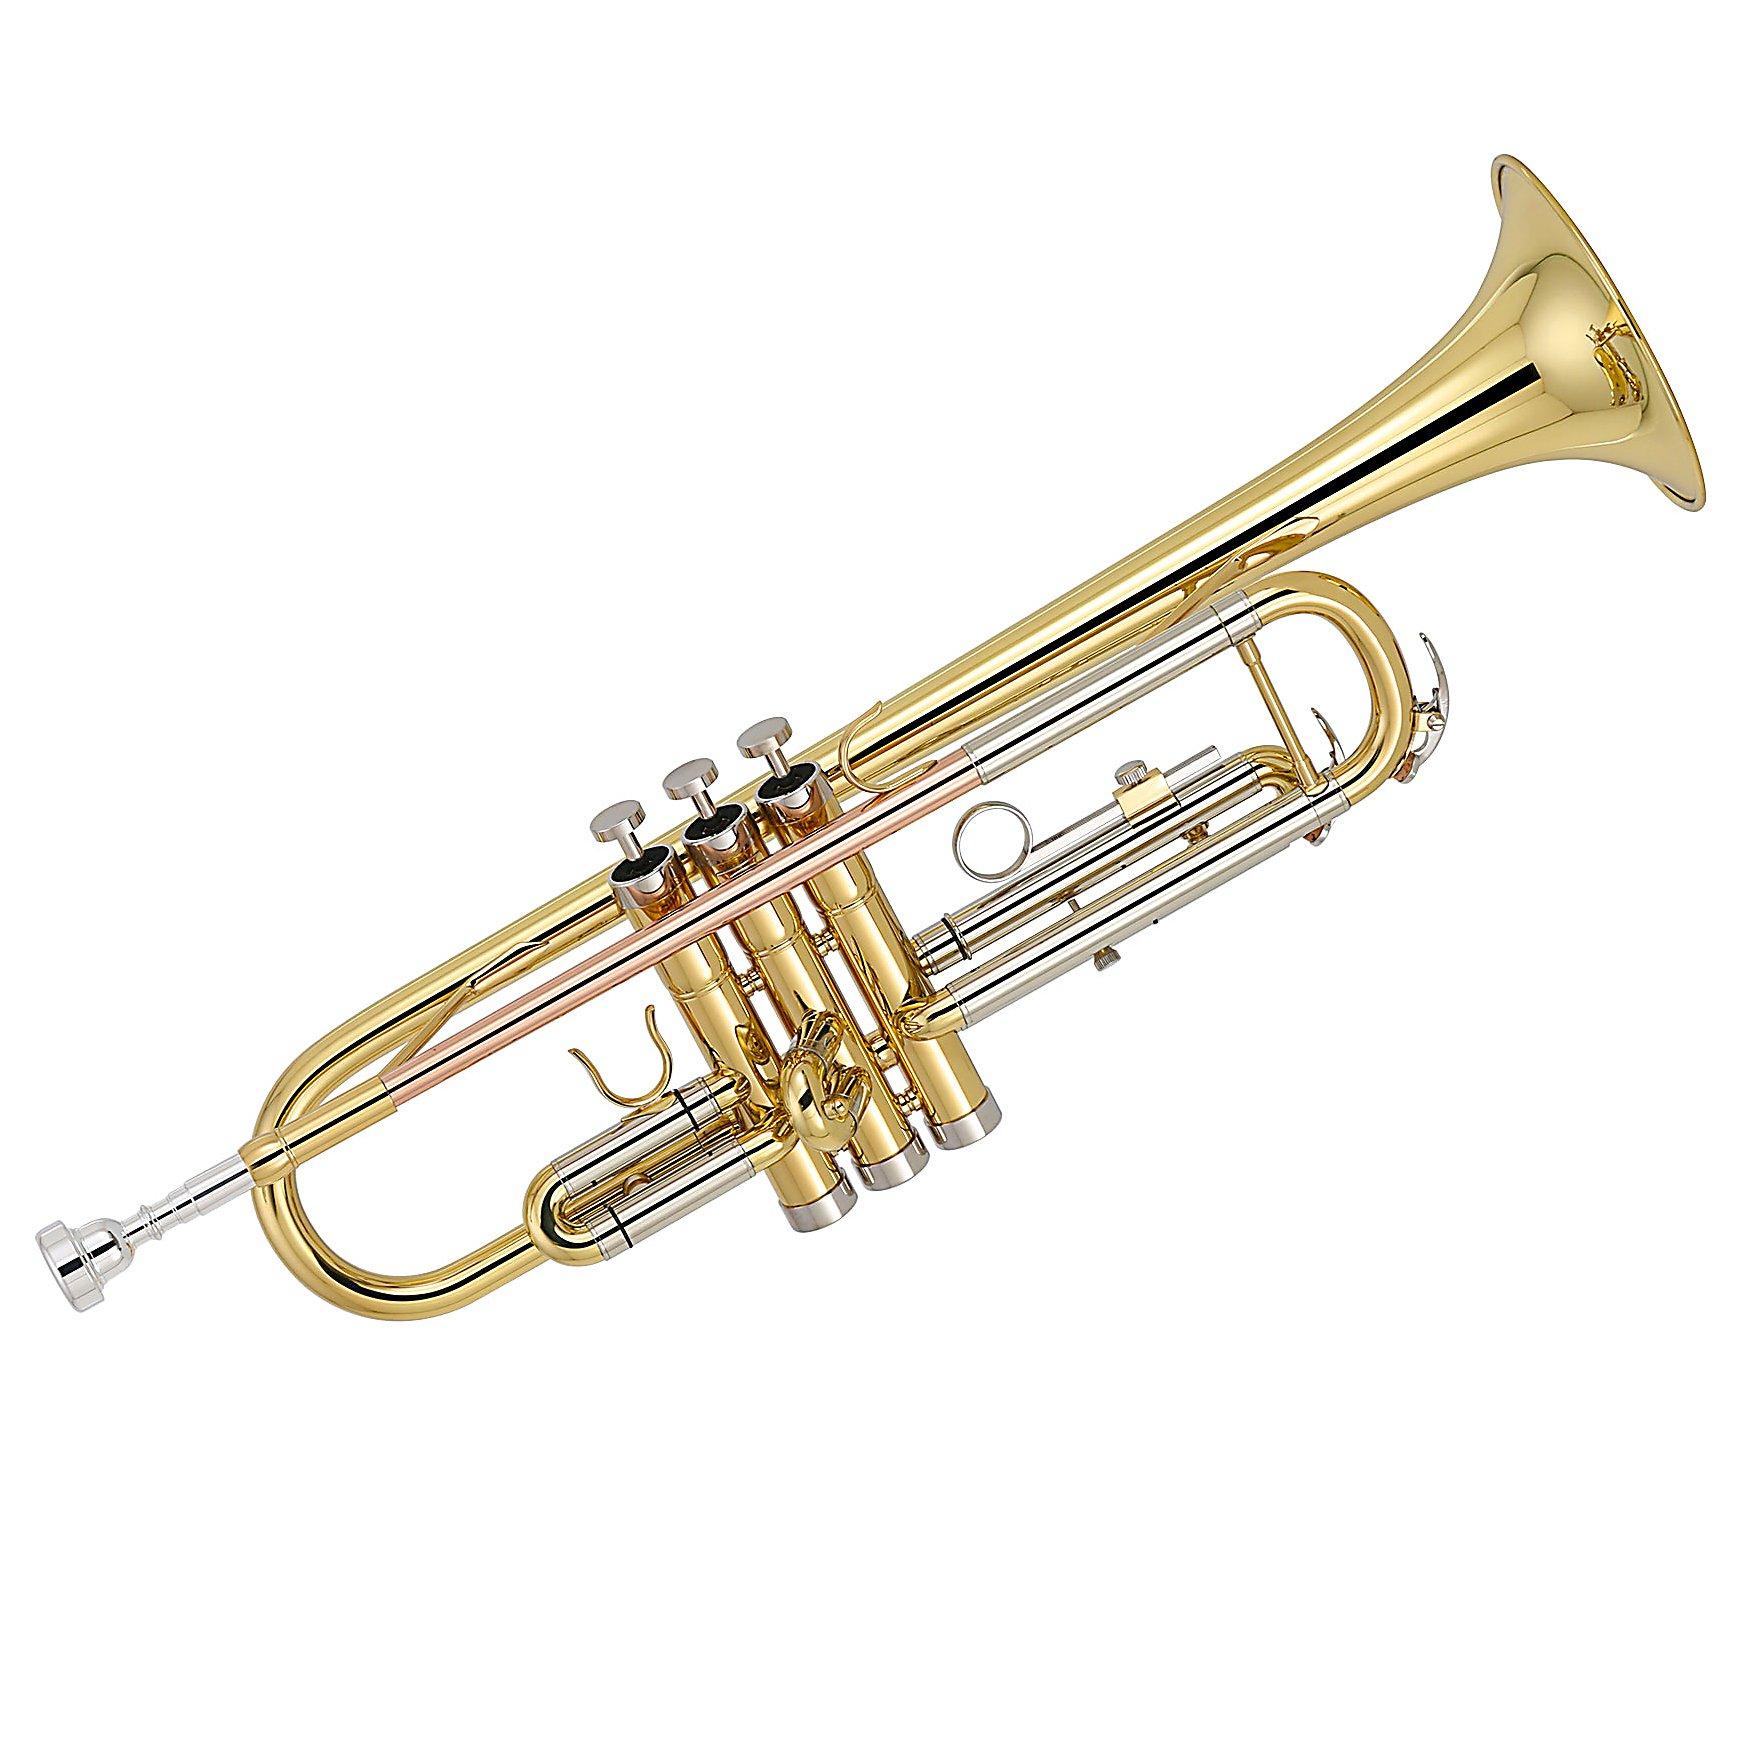 Kaizer TRP-3000LQRC 3000 C Series Standard B Flat Bb Trumpet - Gold by Kaizer